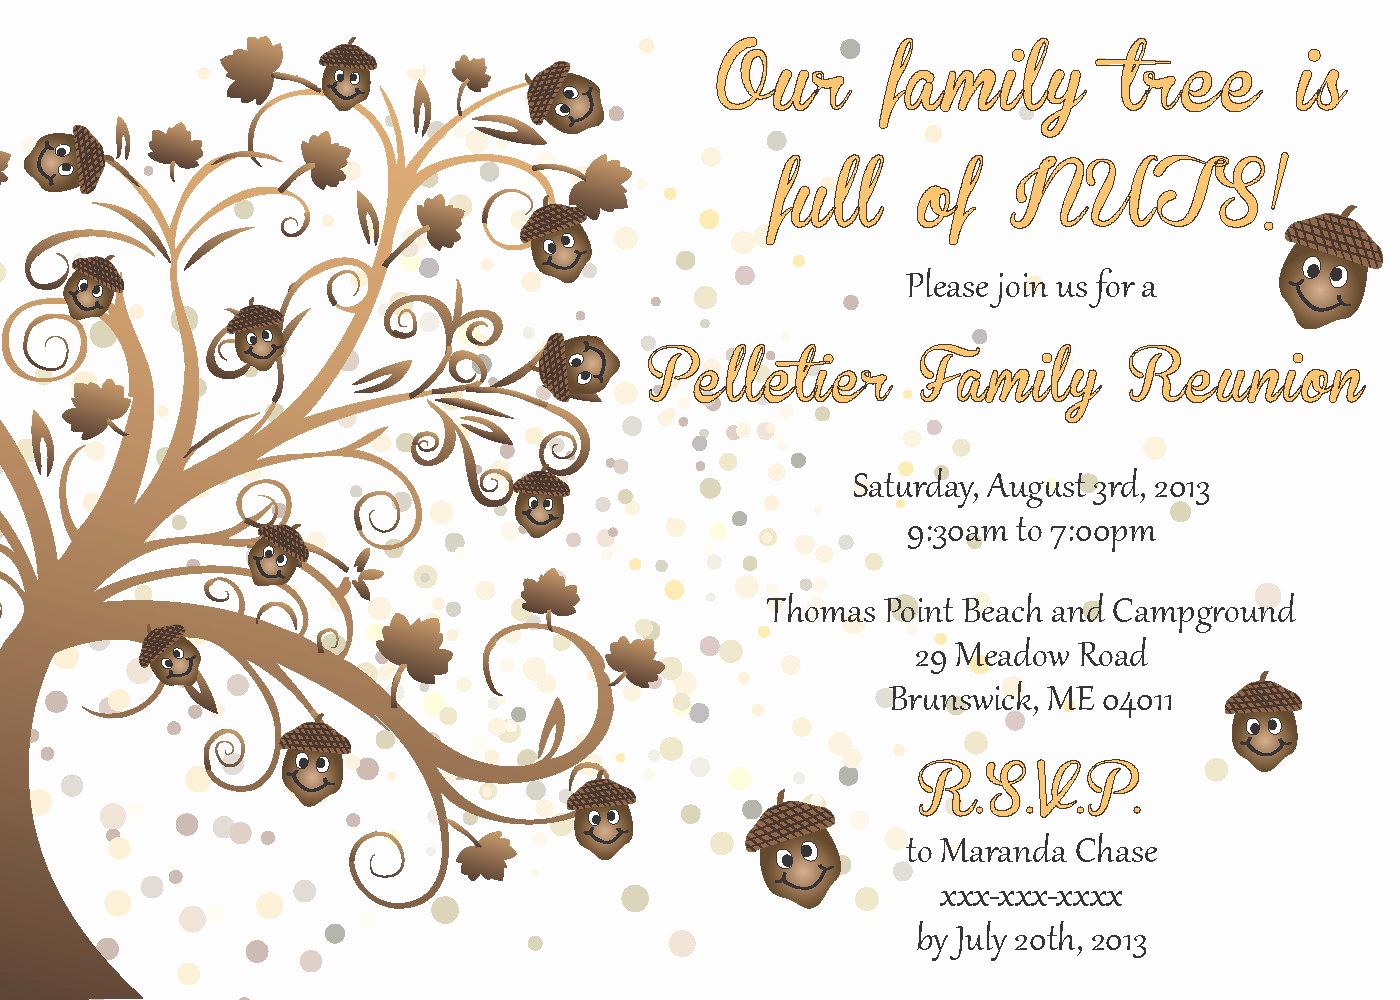 Family Reunion Invitation Templates Free Awesome Family Reunion Invitation by Littlebopress On Etsy